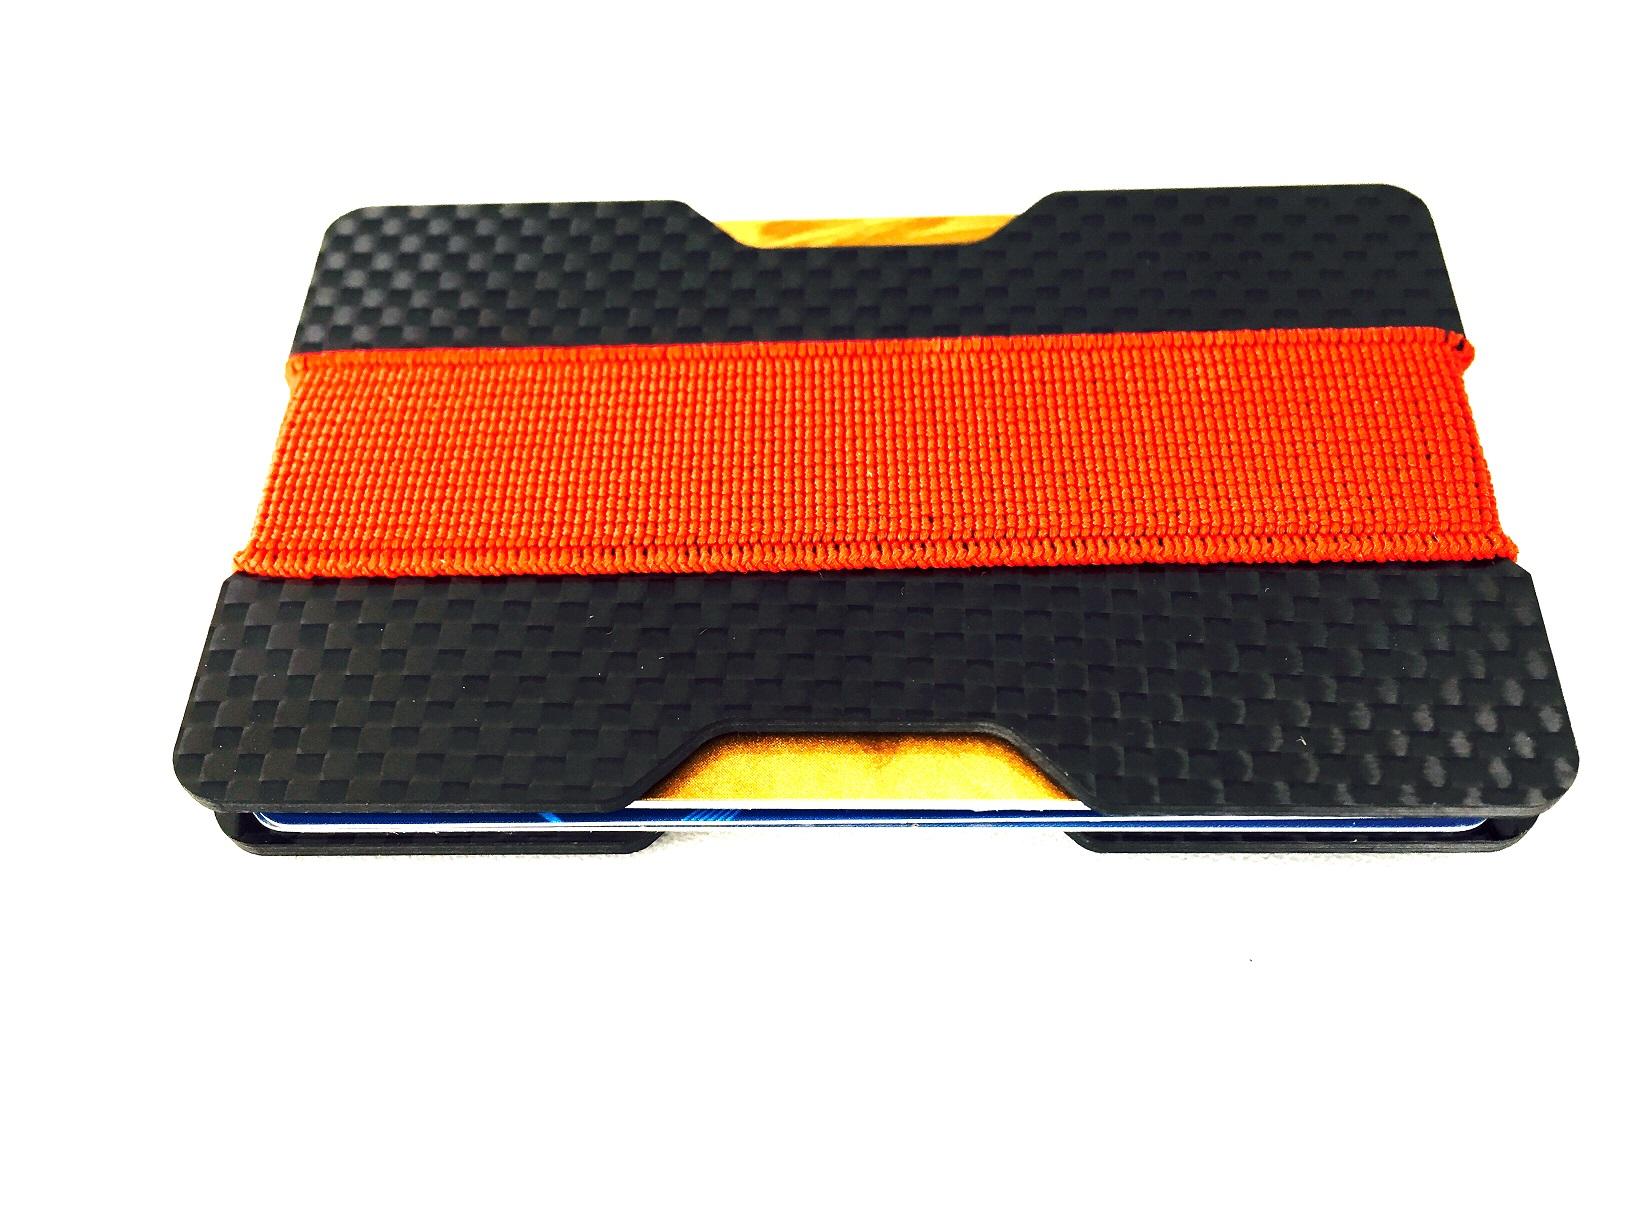 Carbon fiber money holder 2 plates